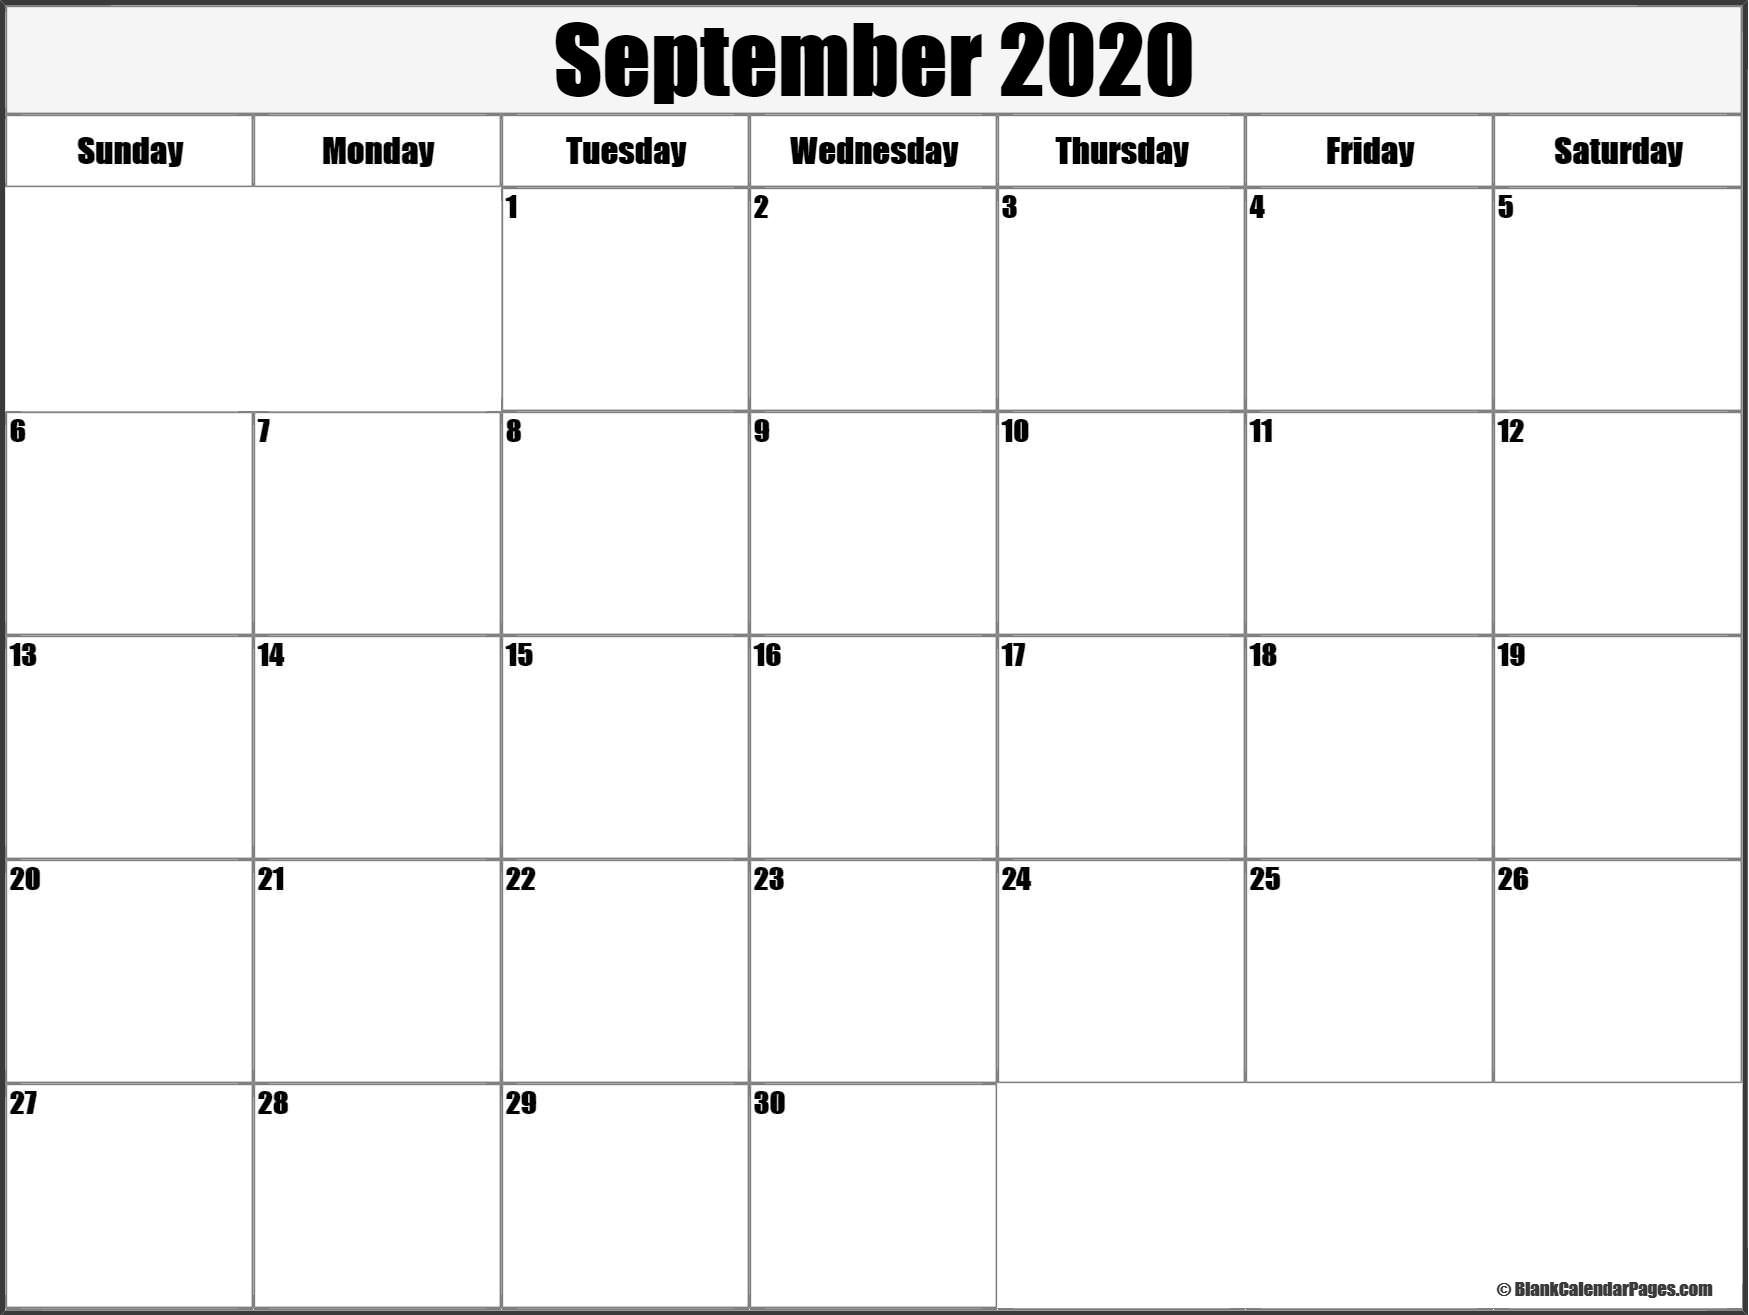 September 2020 Blank Calendar Templates.